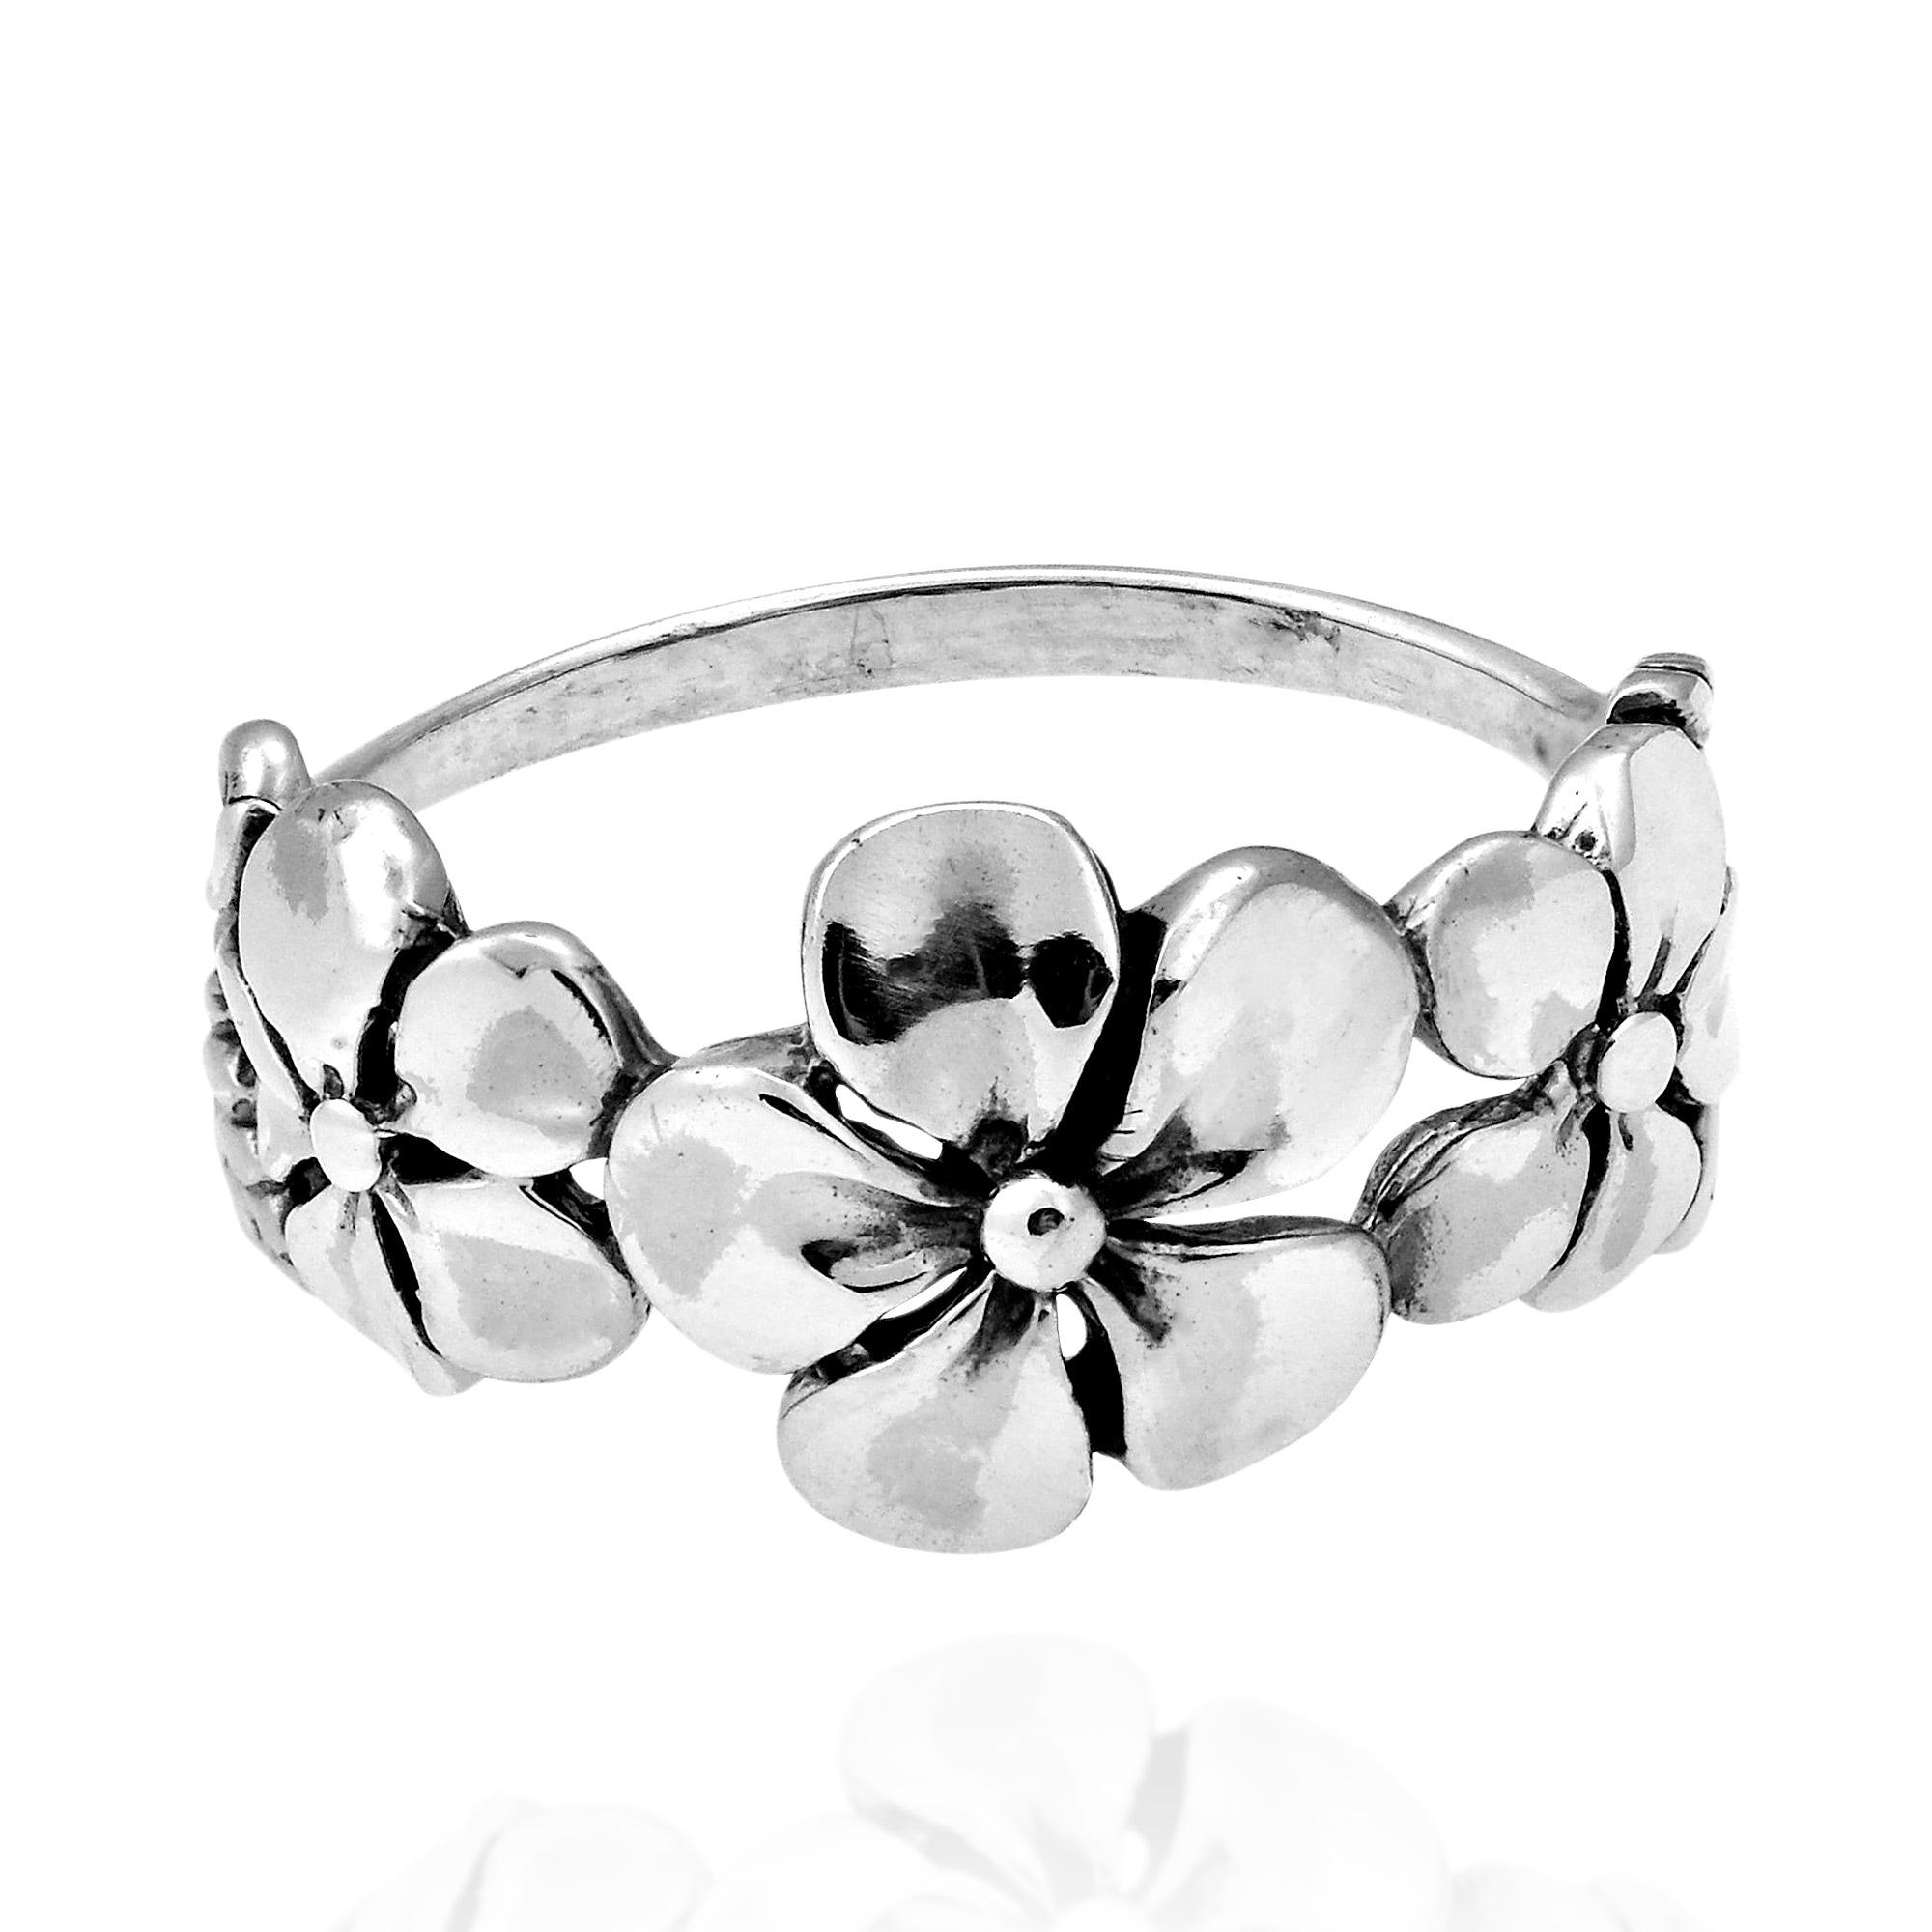 Shop handmade hawaiian triple flower sterling silver ring thailand shop handmade hawaiian triple flower sterling silver ring thailand on sale free shipping on orders over 45 overstock 7524087 izmirmasajfo